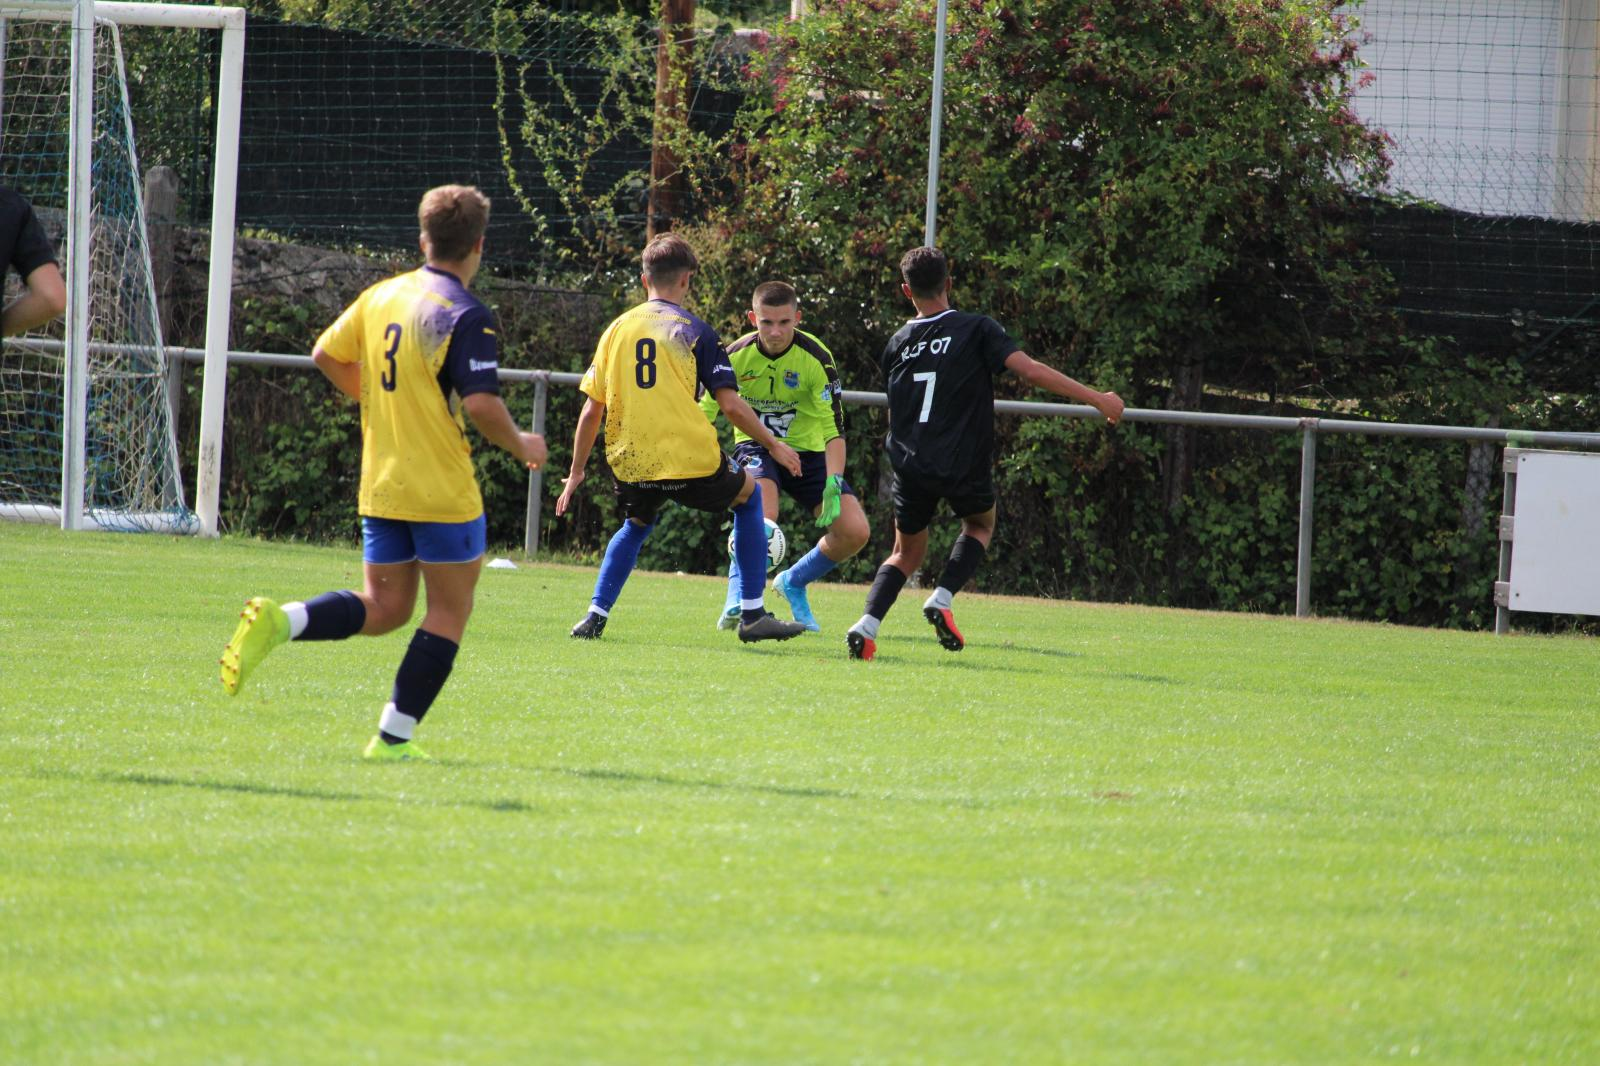 Match amical U18 Rhône CRUSSOL